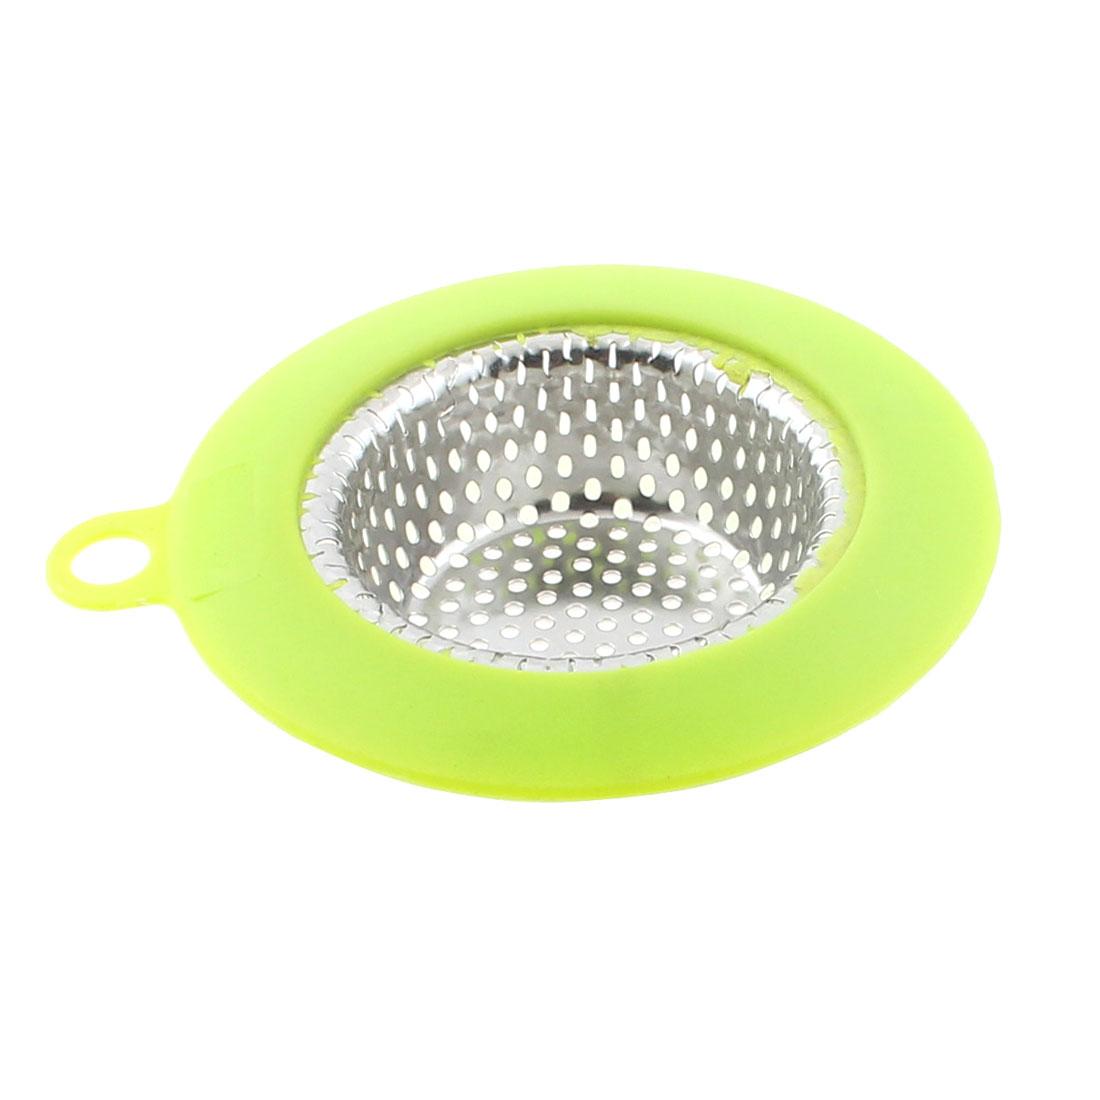 9cm Dia Home Kitchen Sink Basin Drain Waste Filter Strainer Silver Tone Green